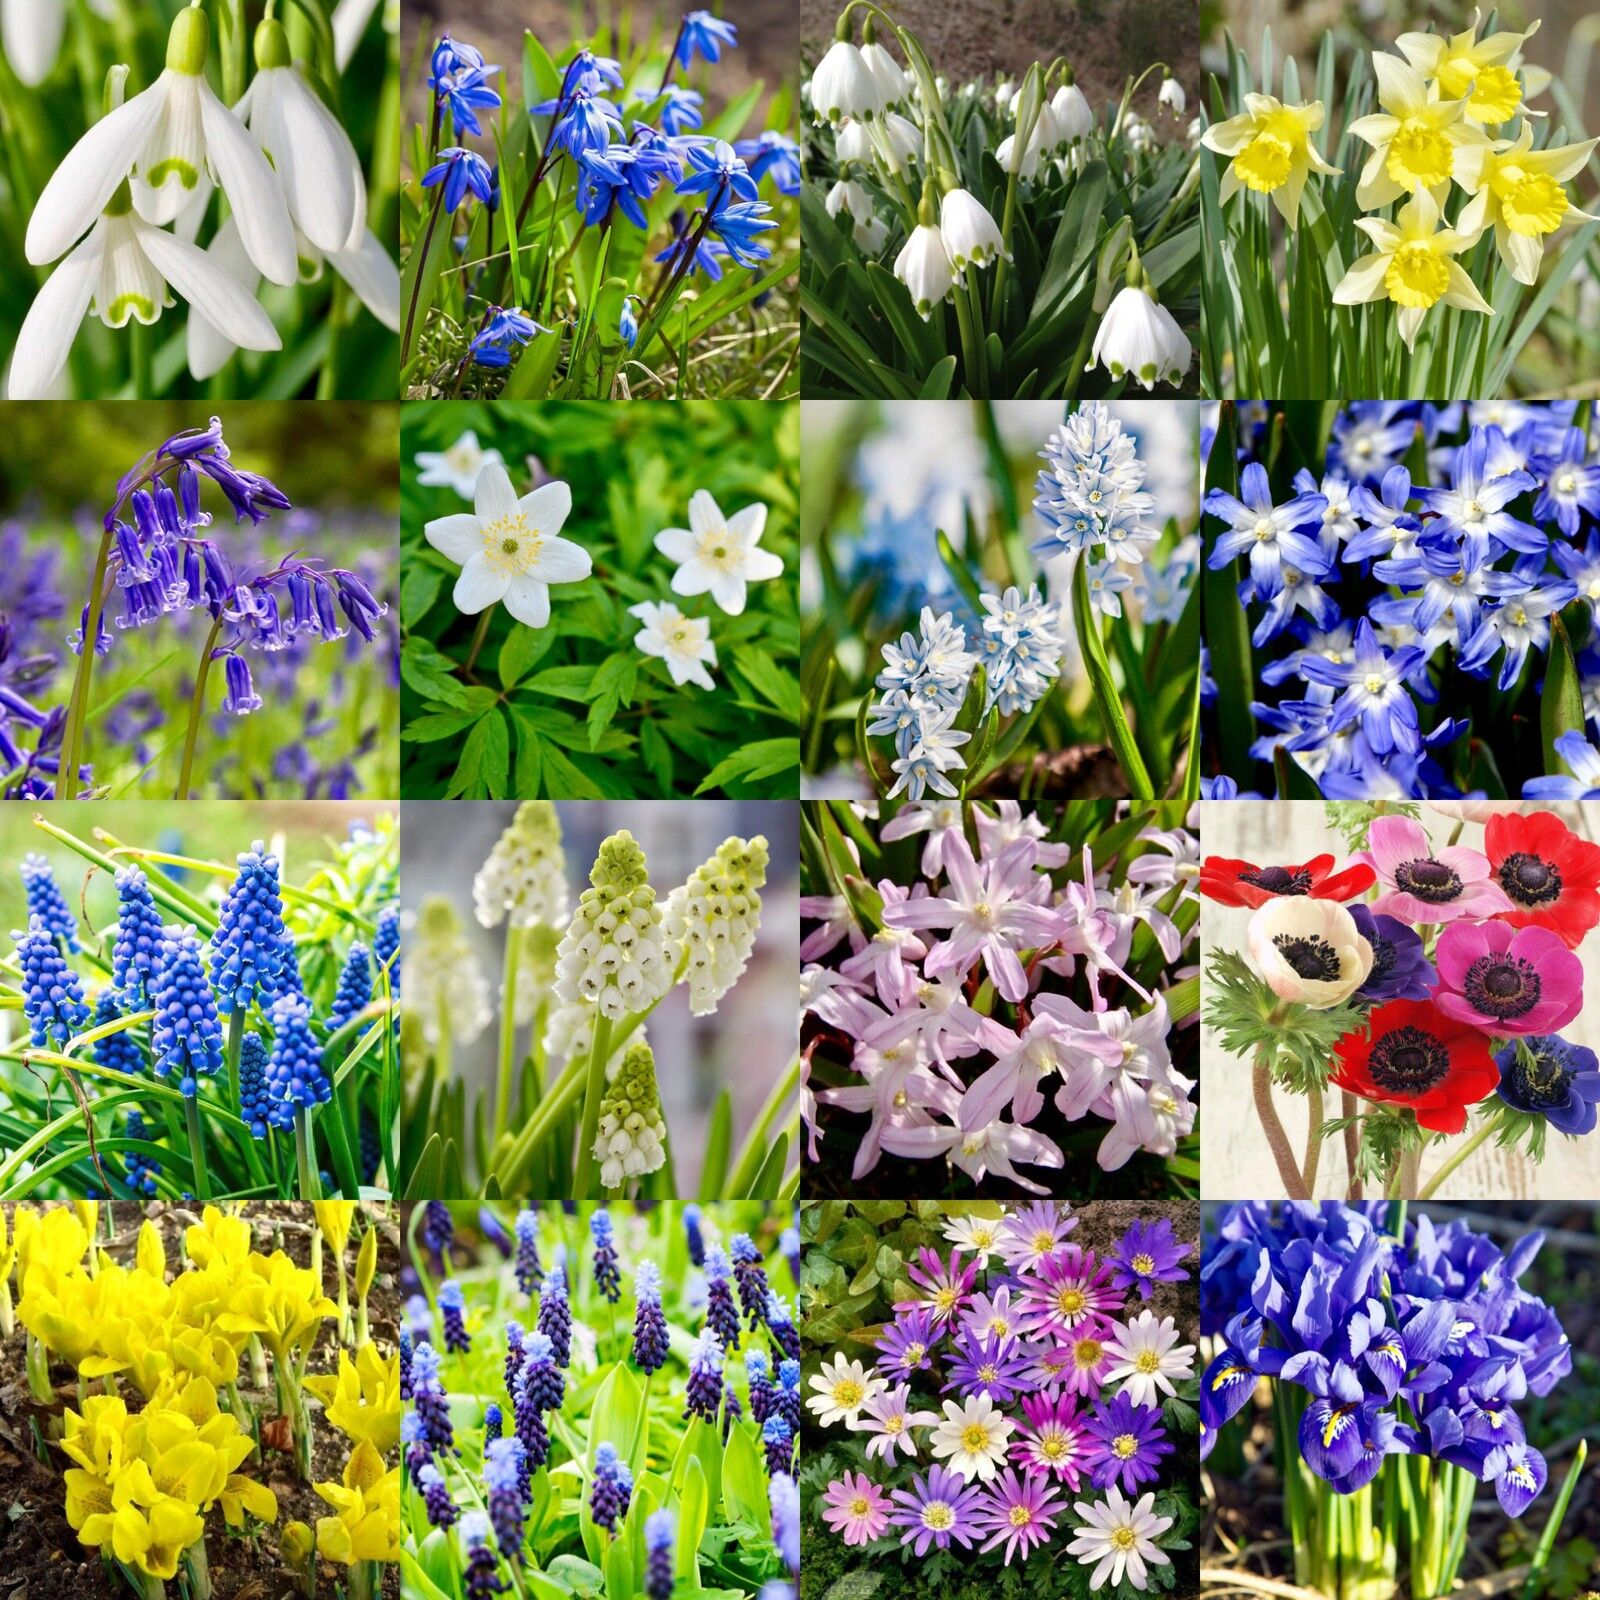 Spring flowering bulbs snowdrops bluebells wild daffs iris spring flowering bulbs snowdrops bluebells wild daffs iris puschkinia mightylinksfo